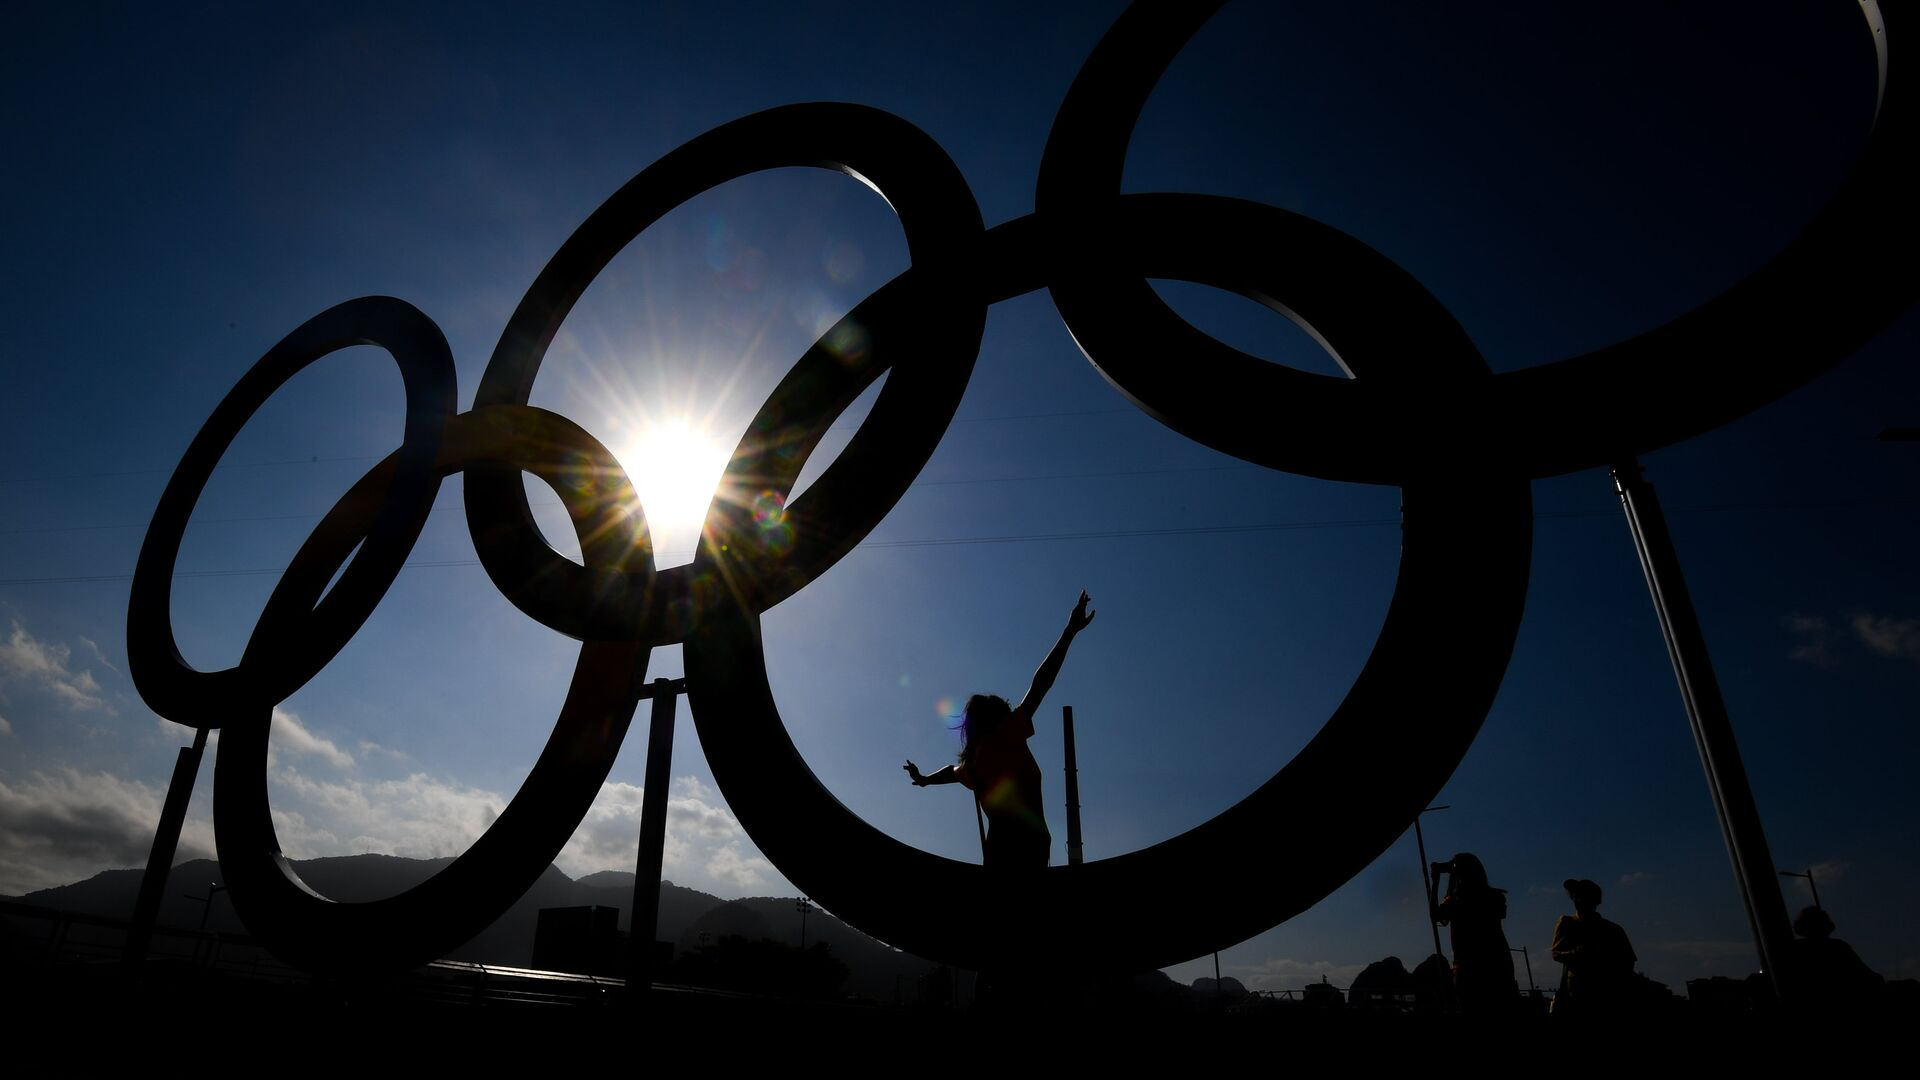 Олимпийские кольца - РИА Новости, 1920, 30.07.2021